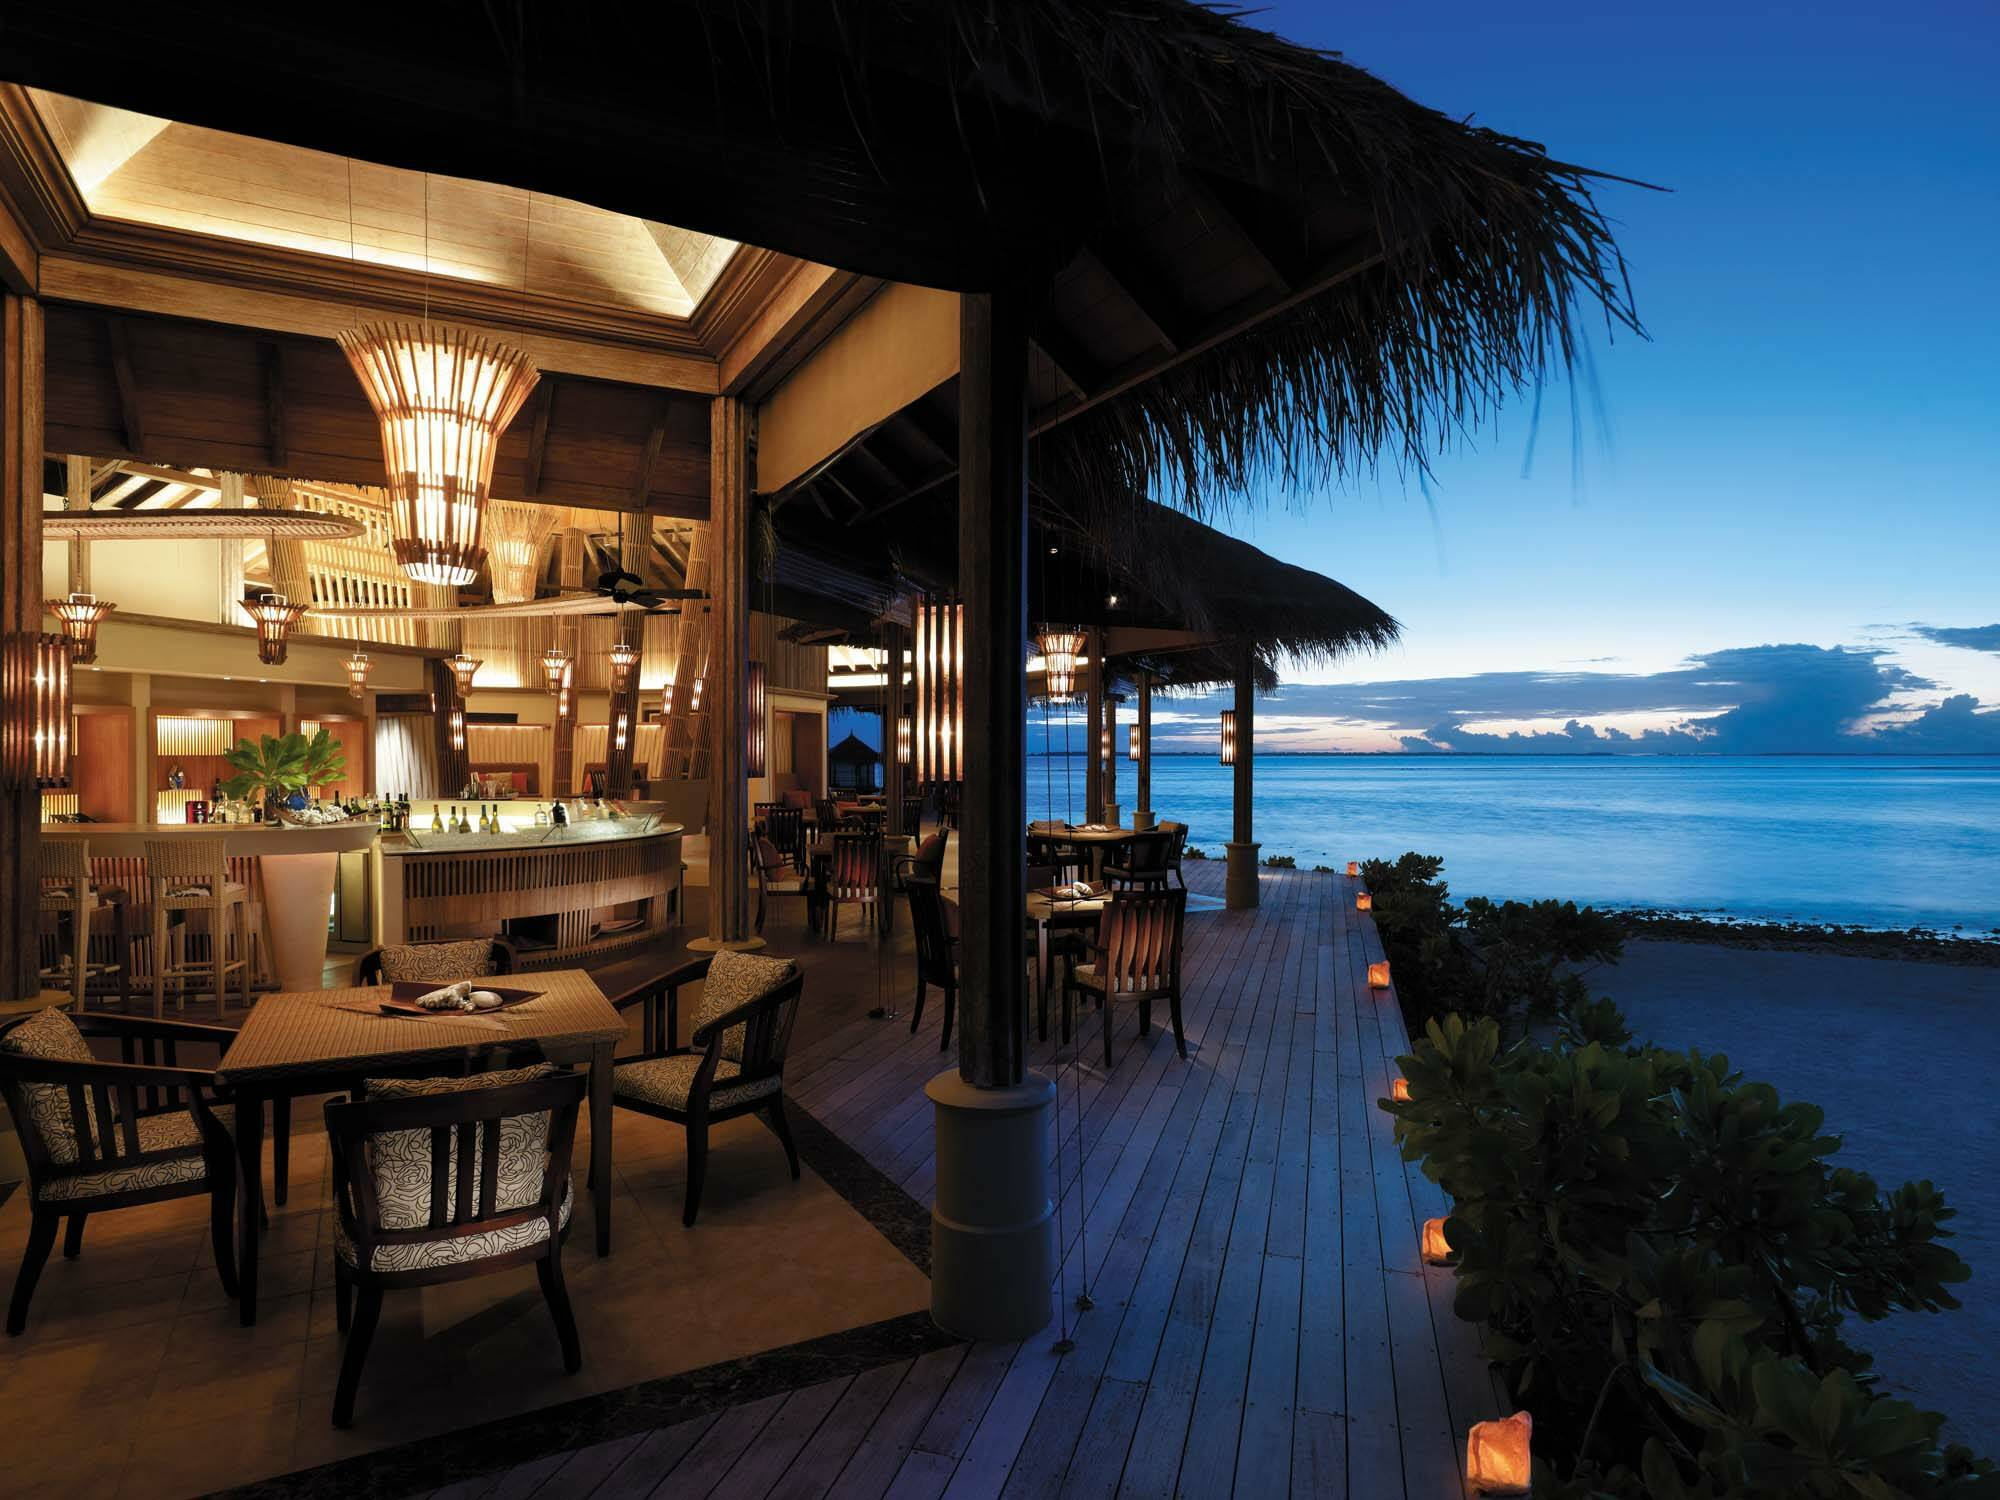 Shangri La Villingili Restaurant Fashala Maldives